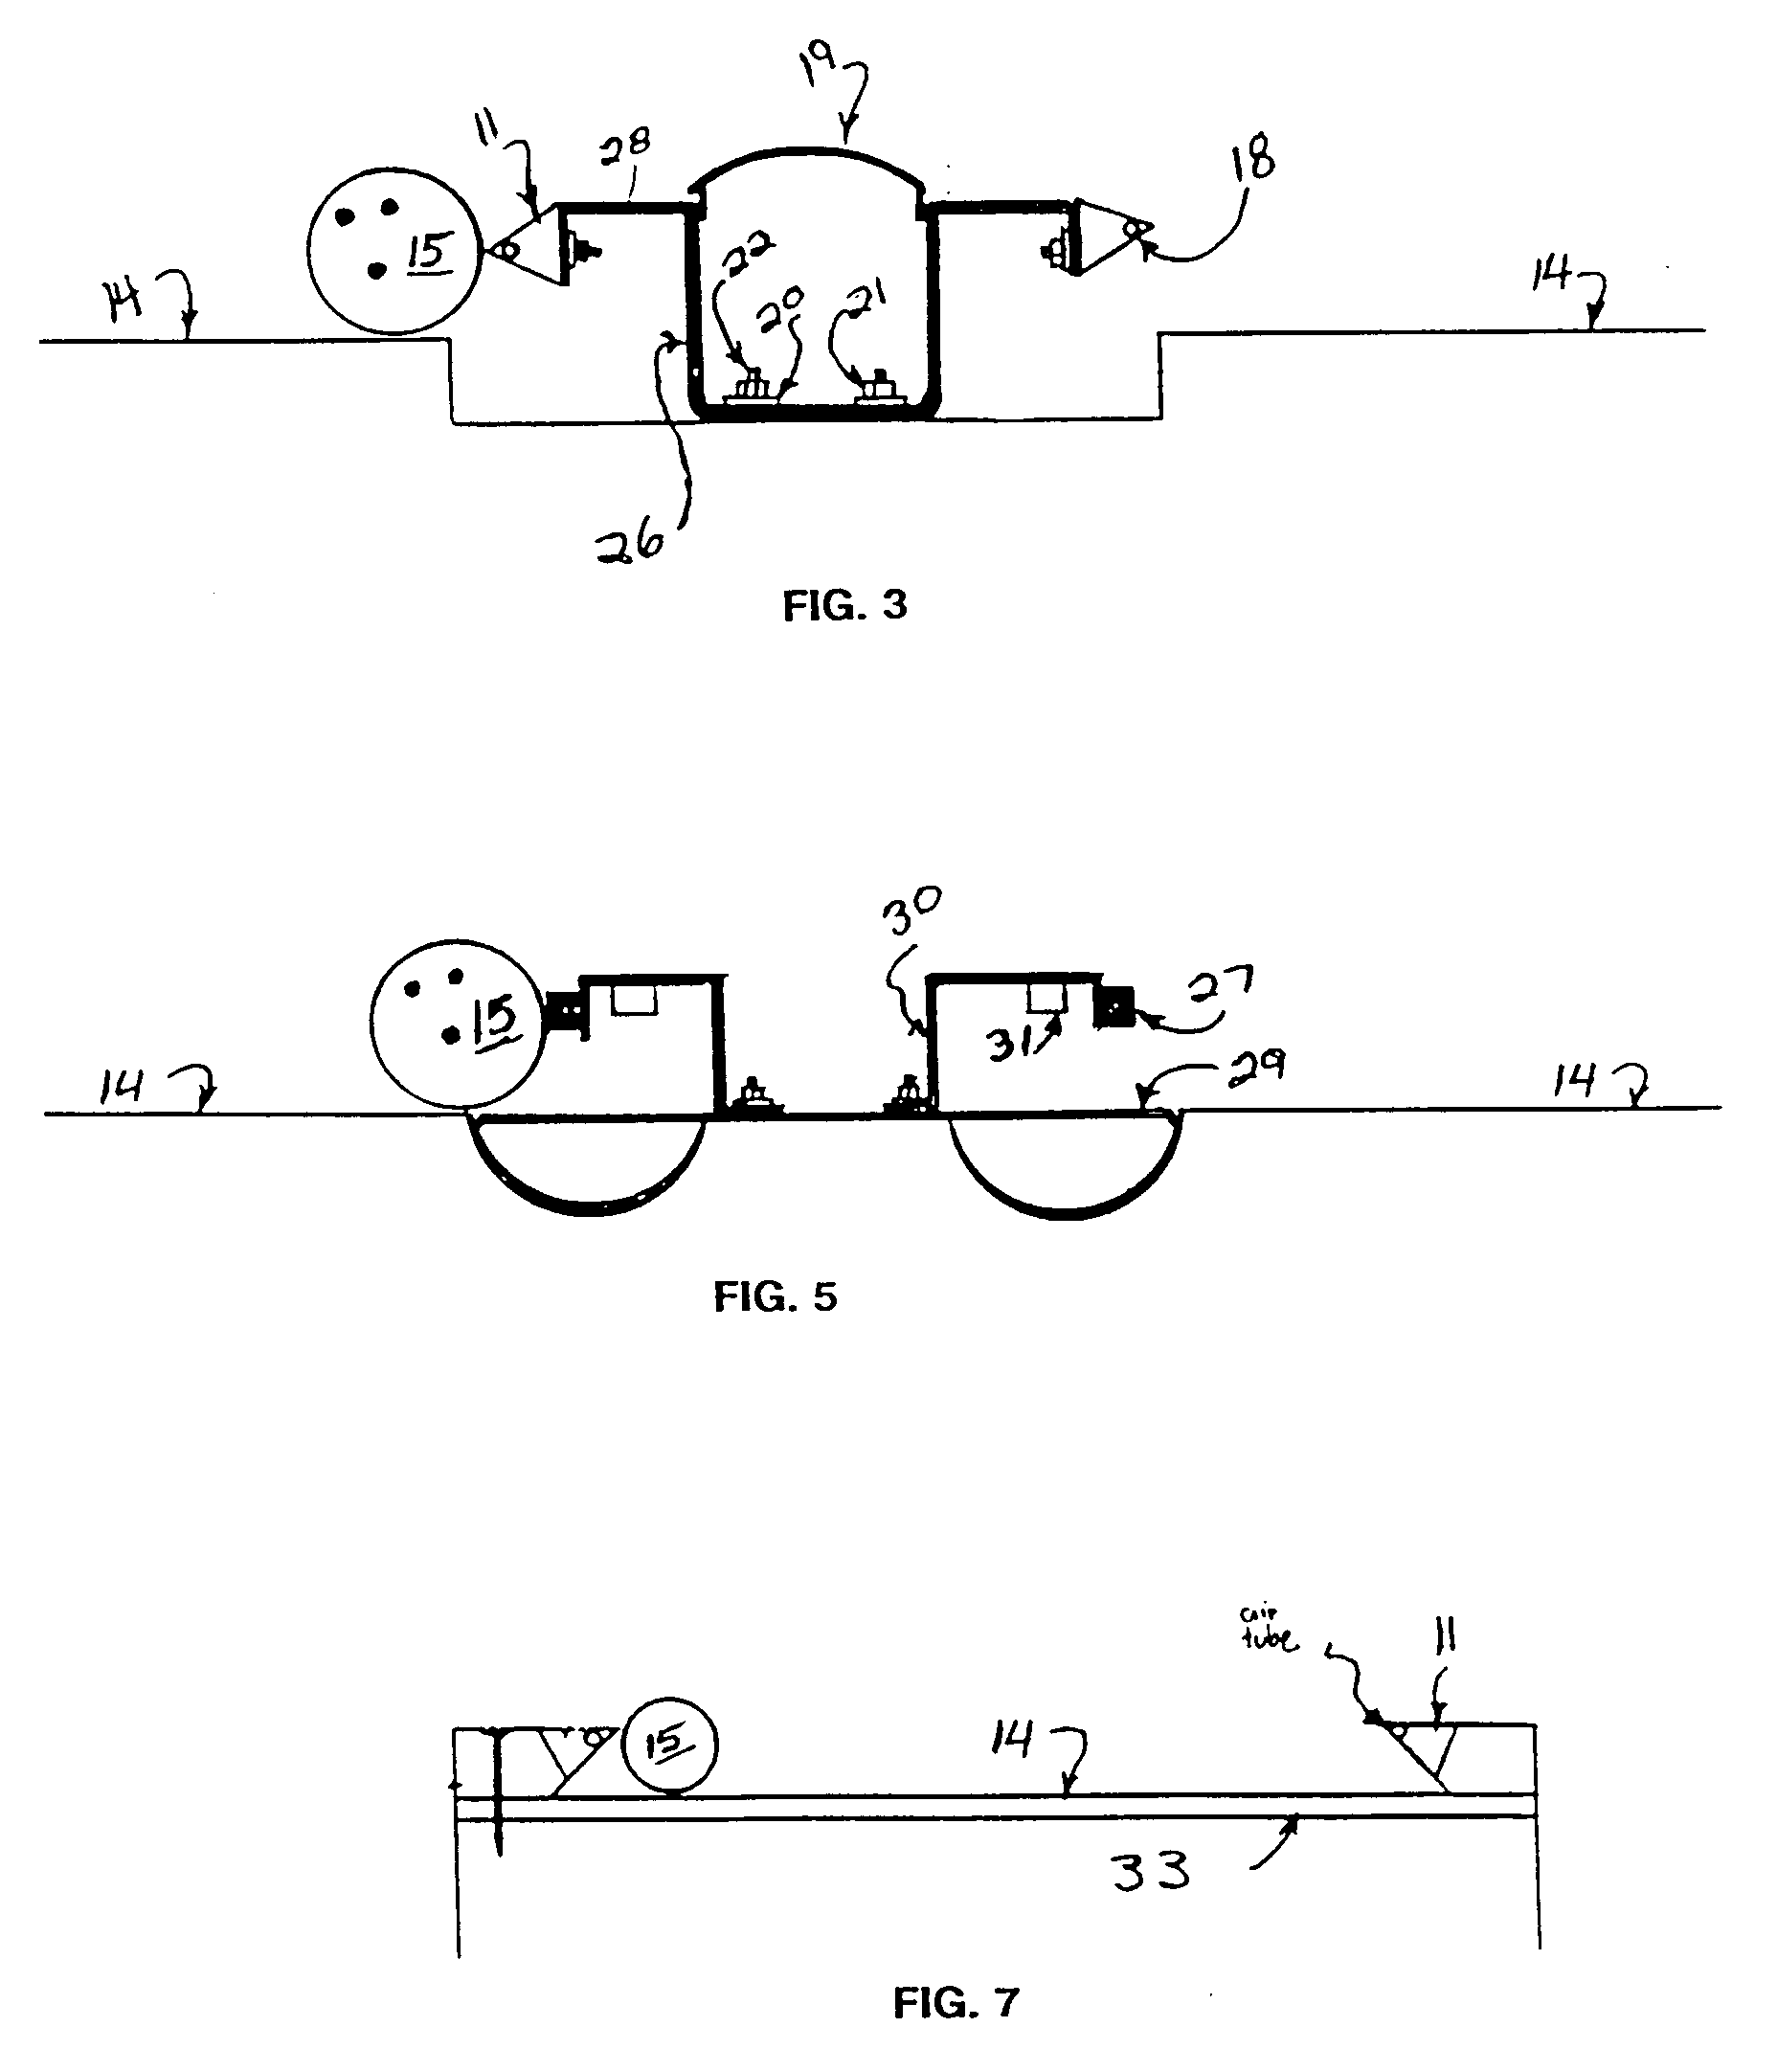 bowling lane dimensions diagram traffic light cycle width